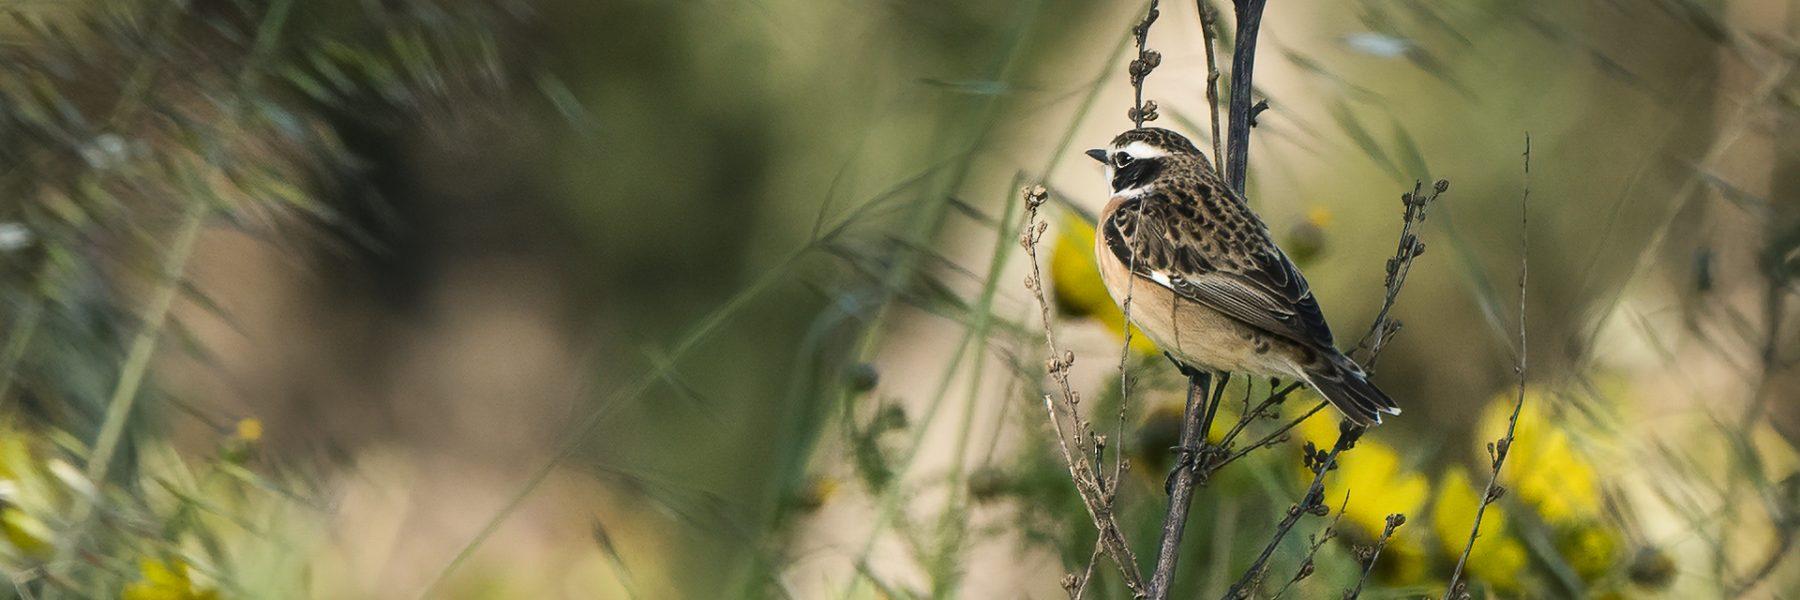 Marco Andriola Wildlife Photography